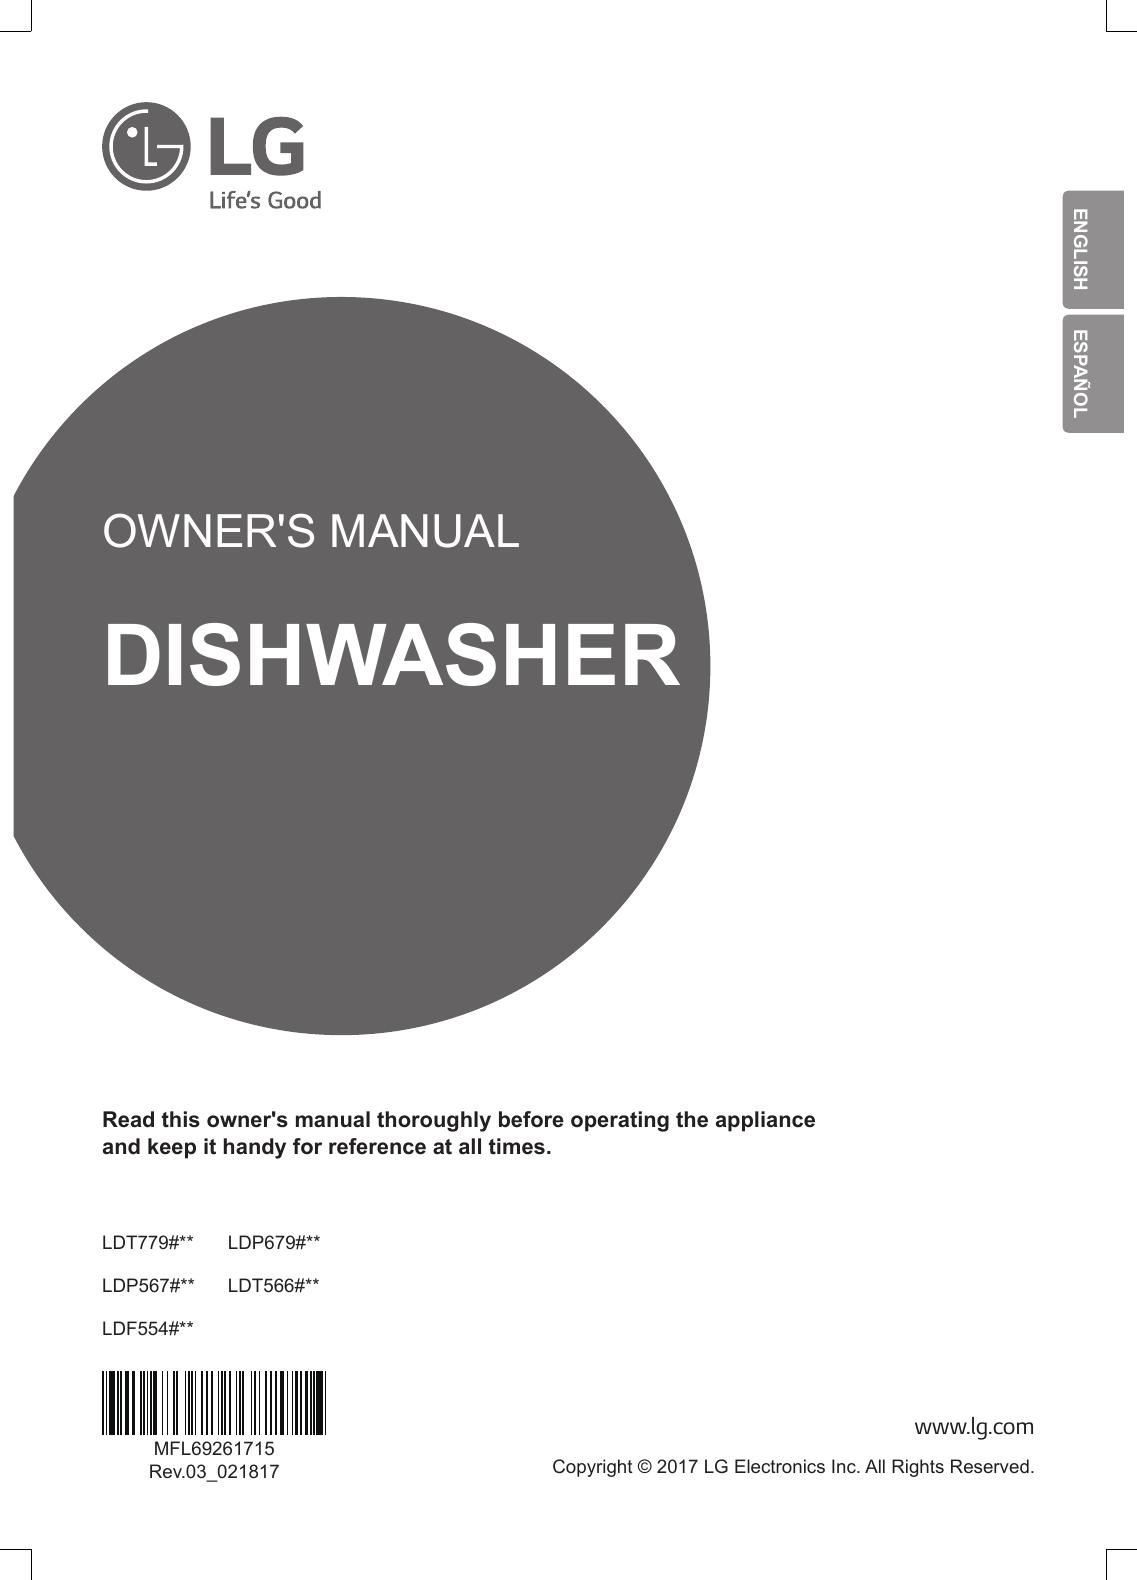 51 00 Each Manual Guide